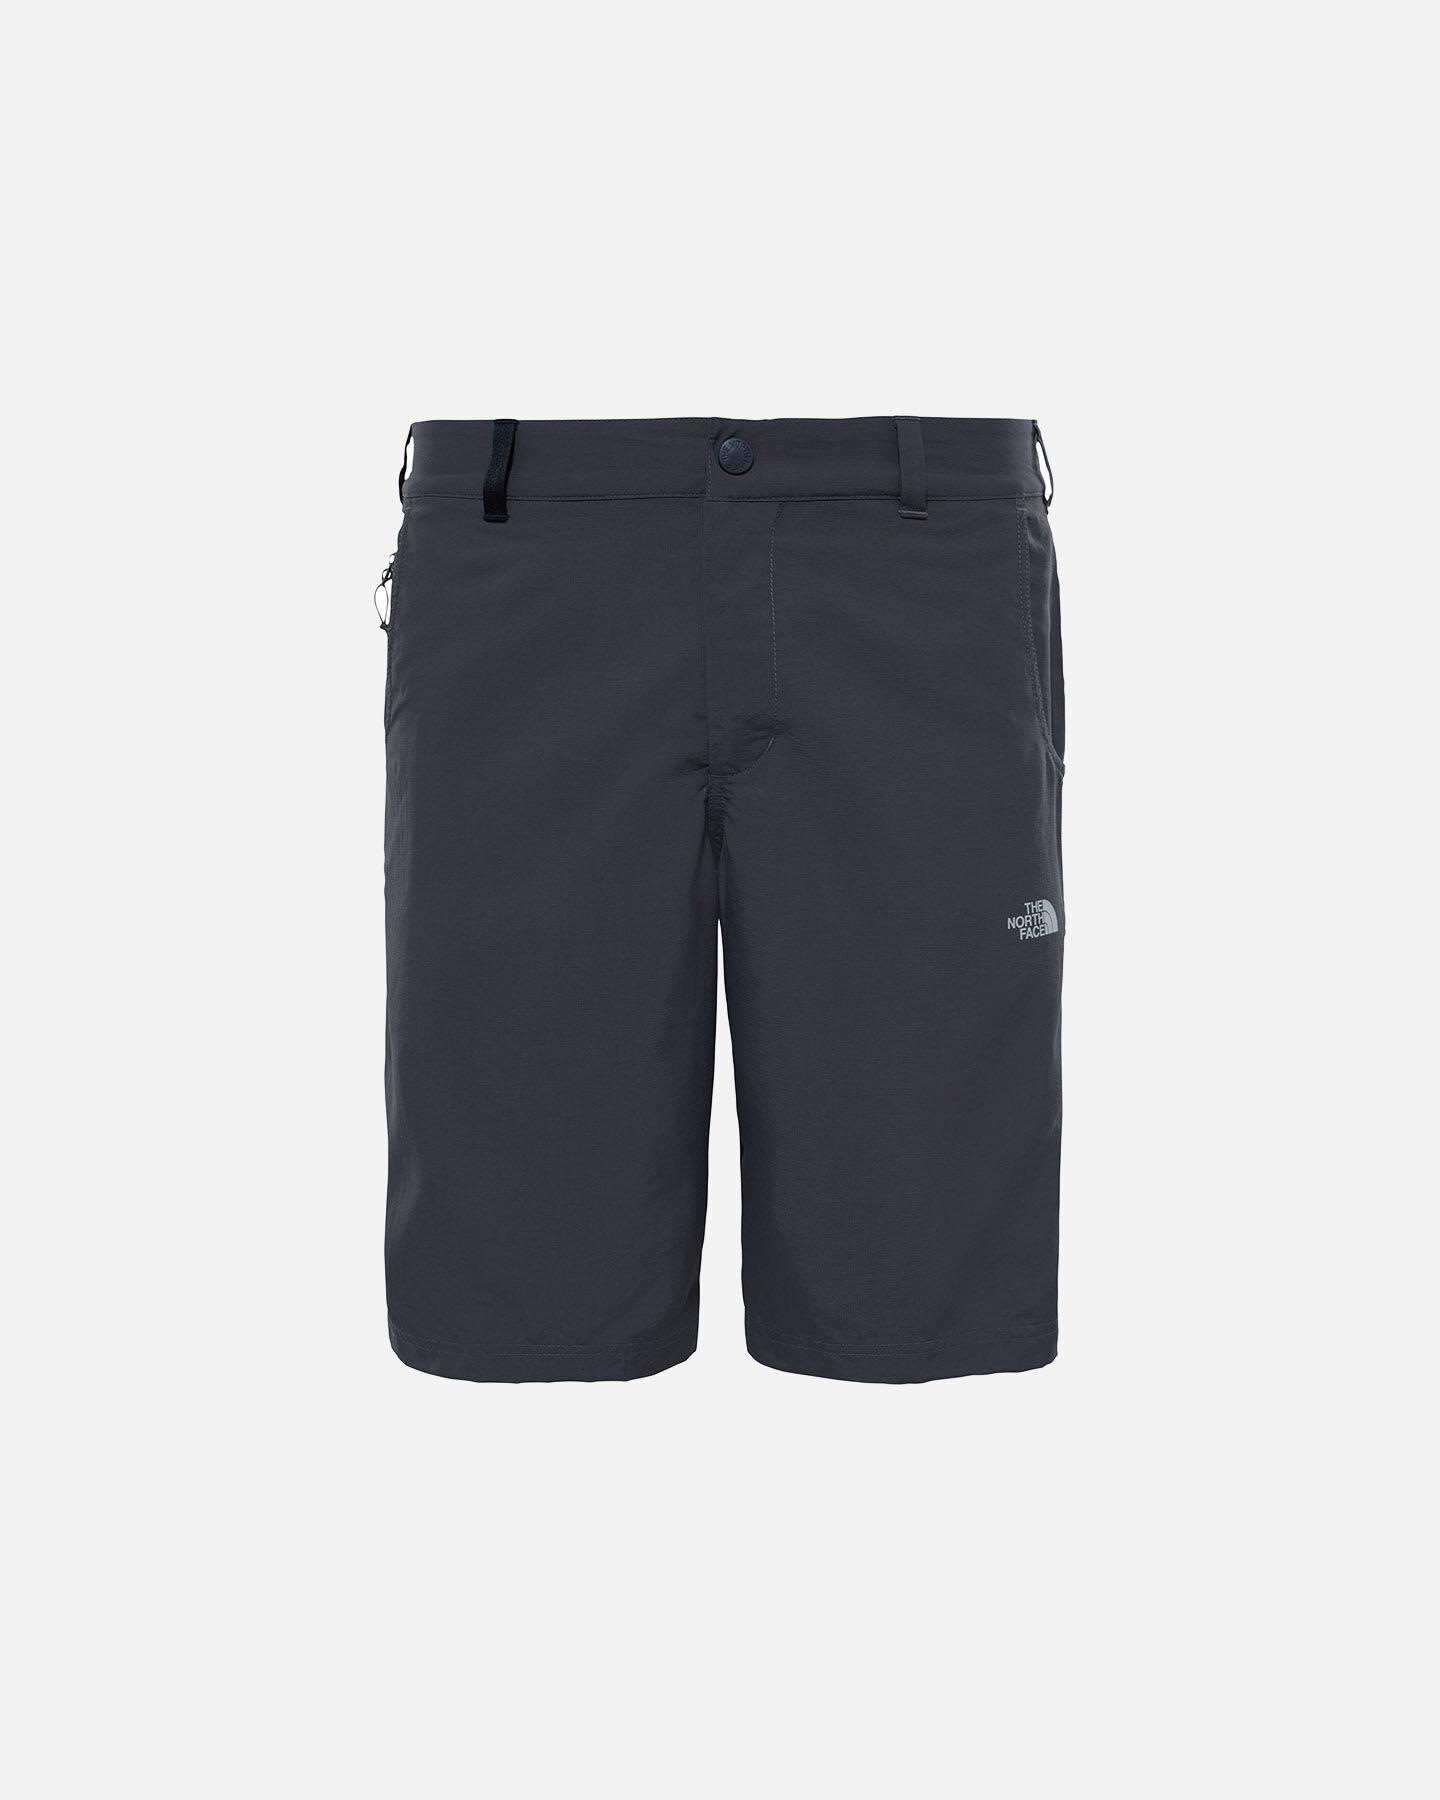 Pantaloncini THE NORTH FACE TAKEN M S4020289 scatto 0